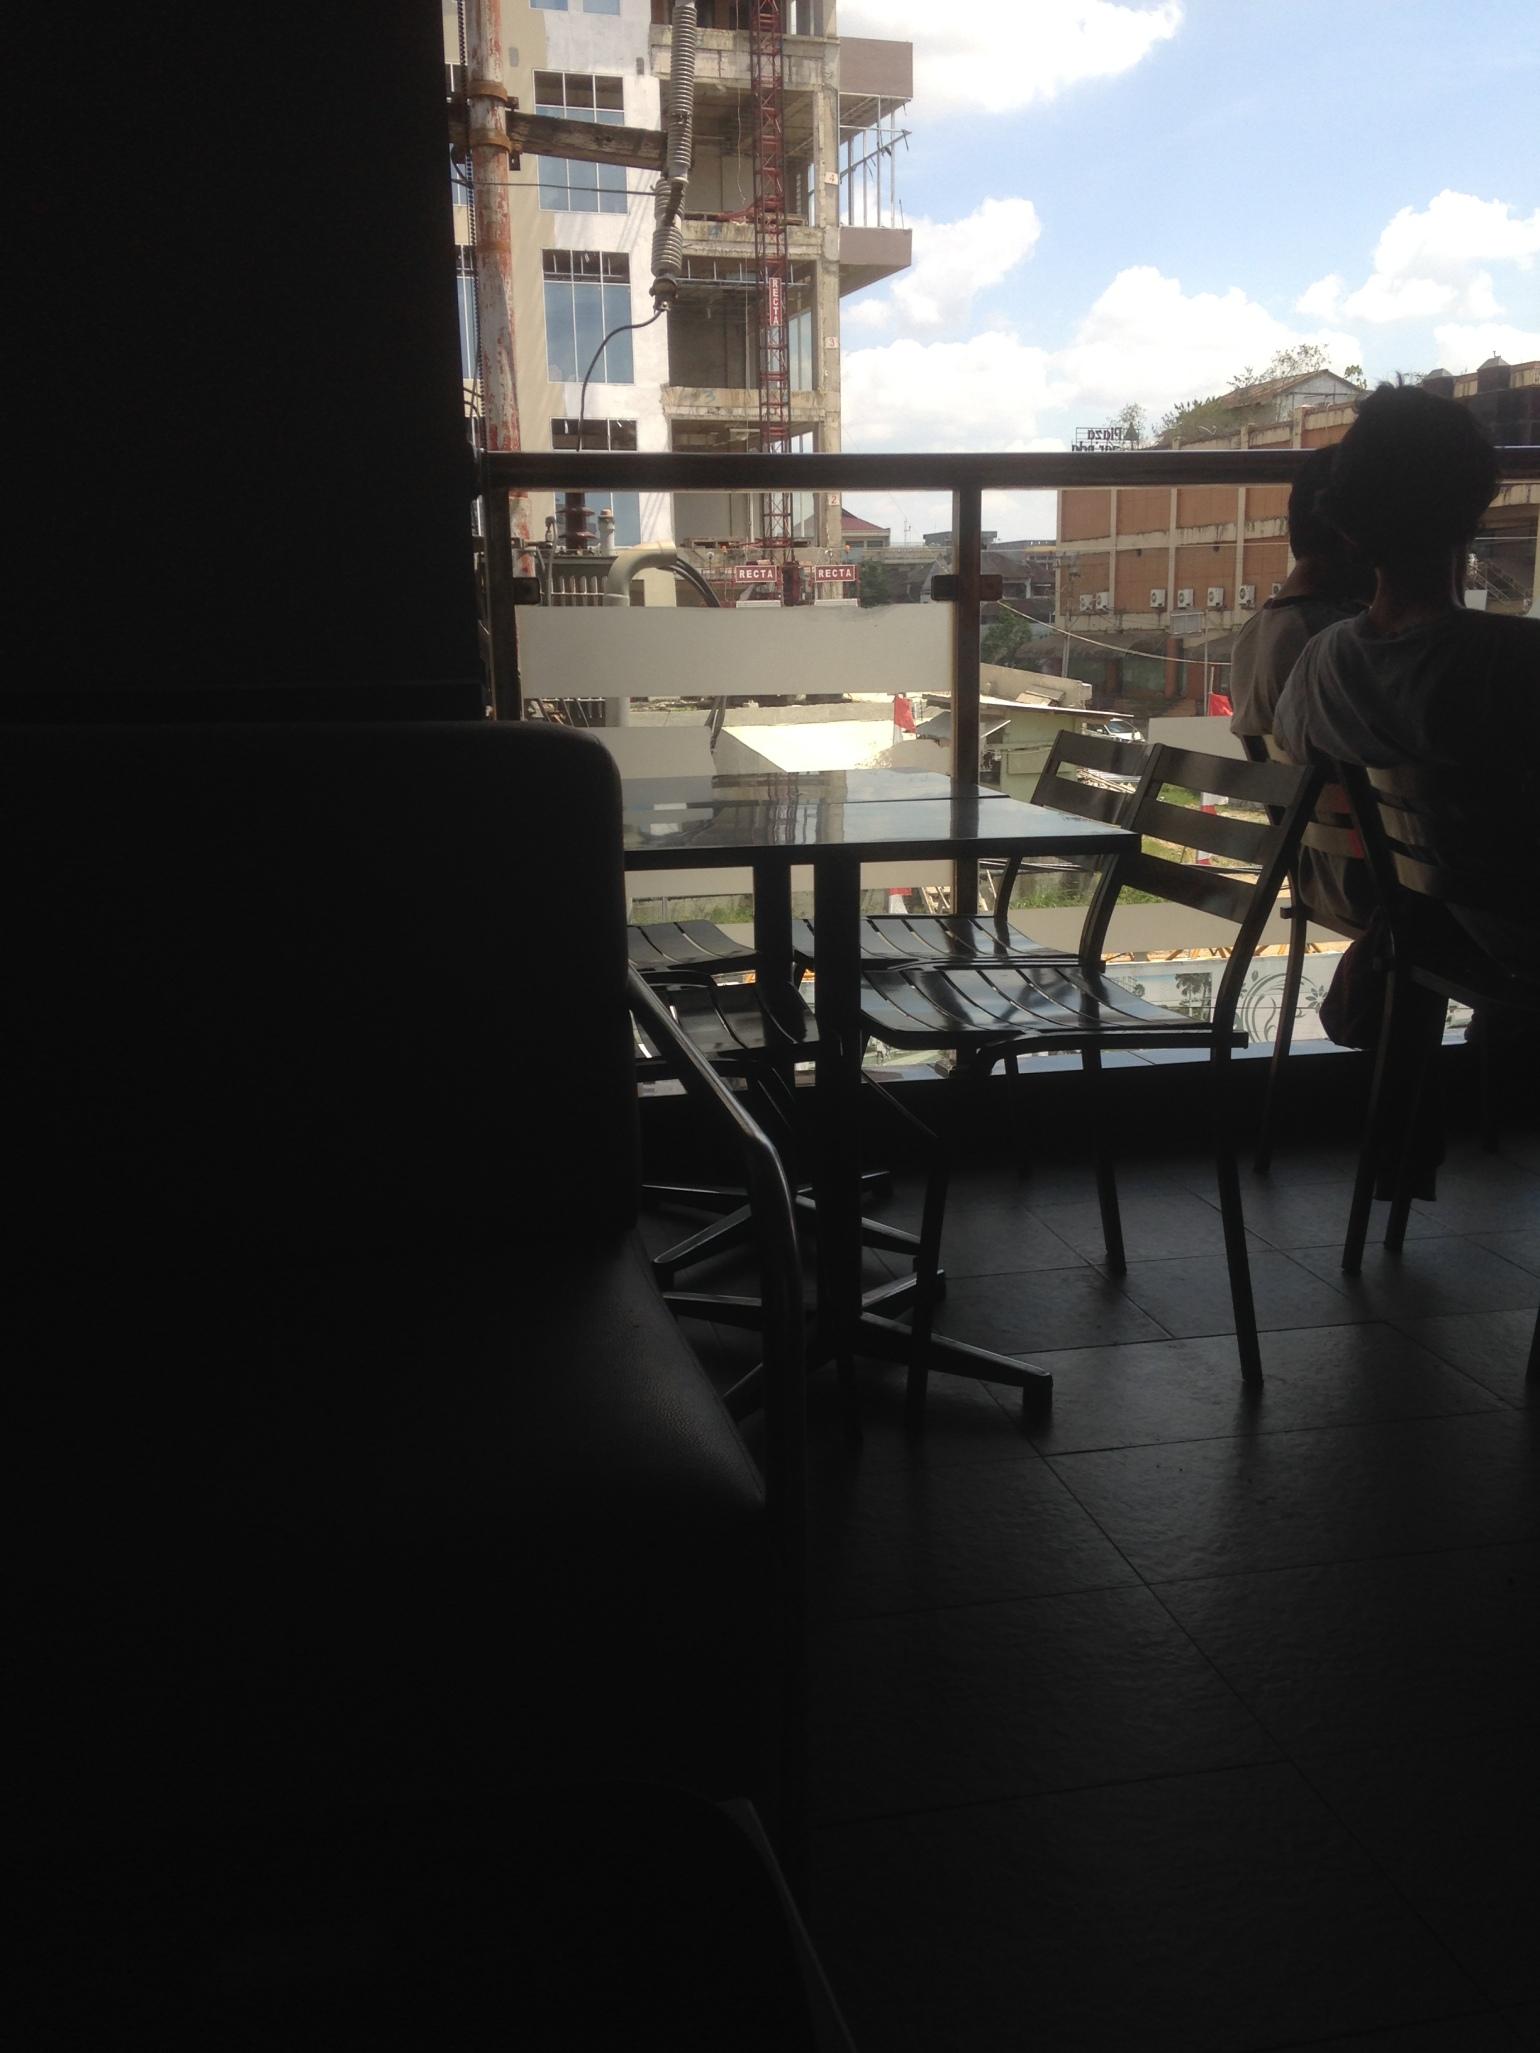 Foto diambil dari posisi nongkrong, dan cewek SMA duduk di kursi paling ujung.